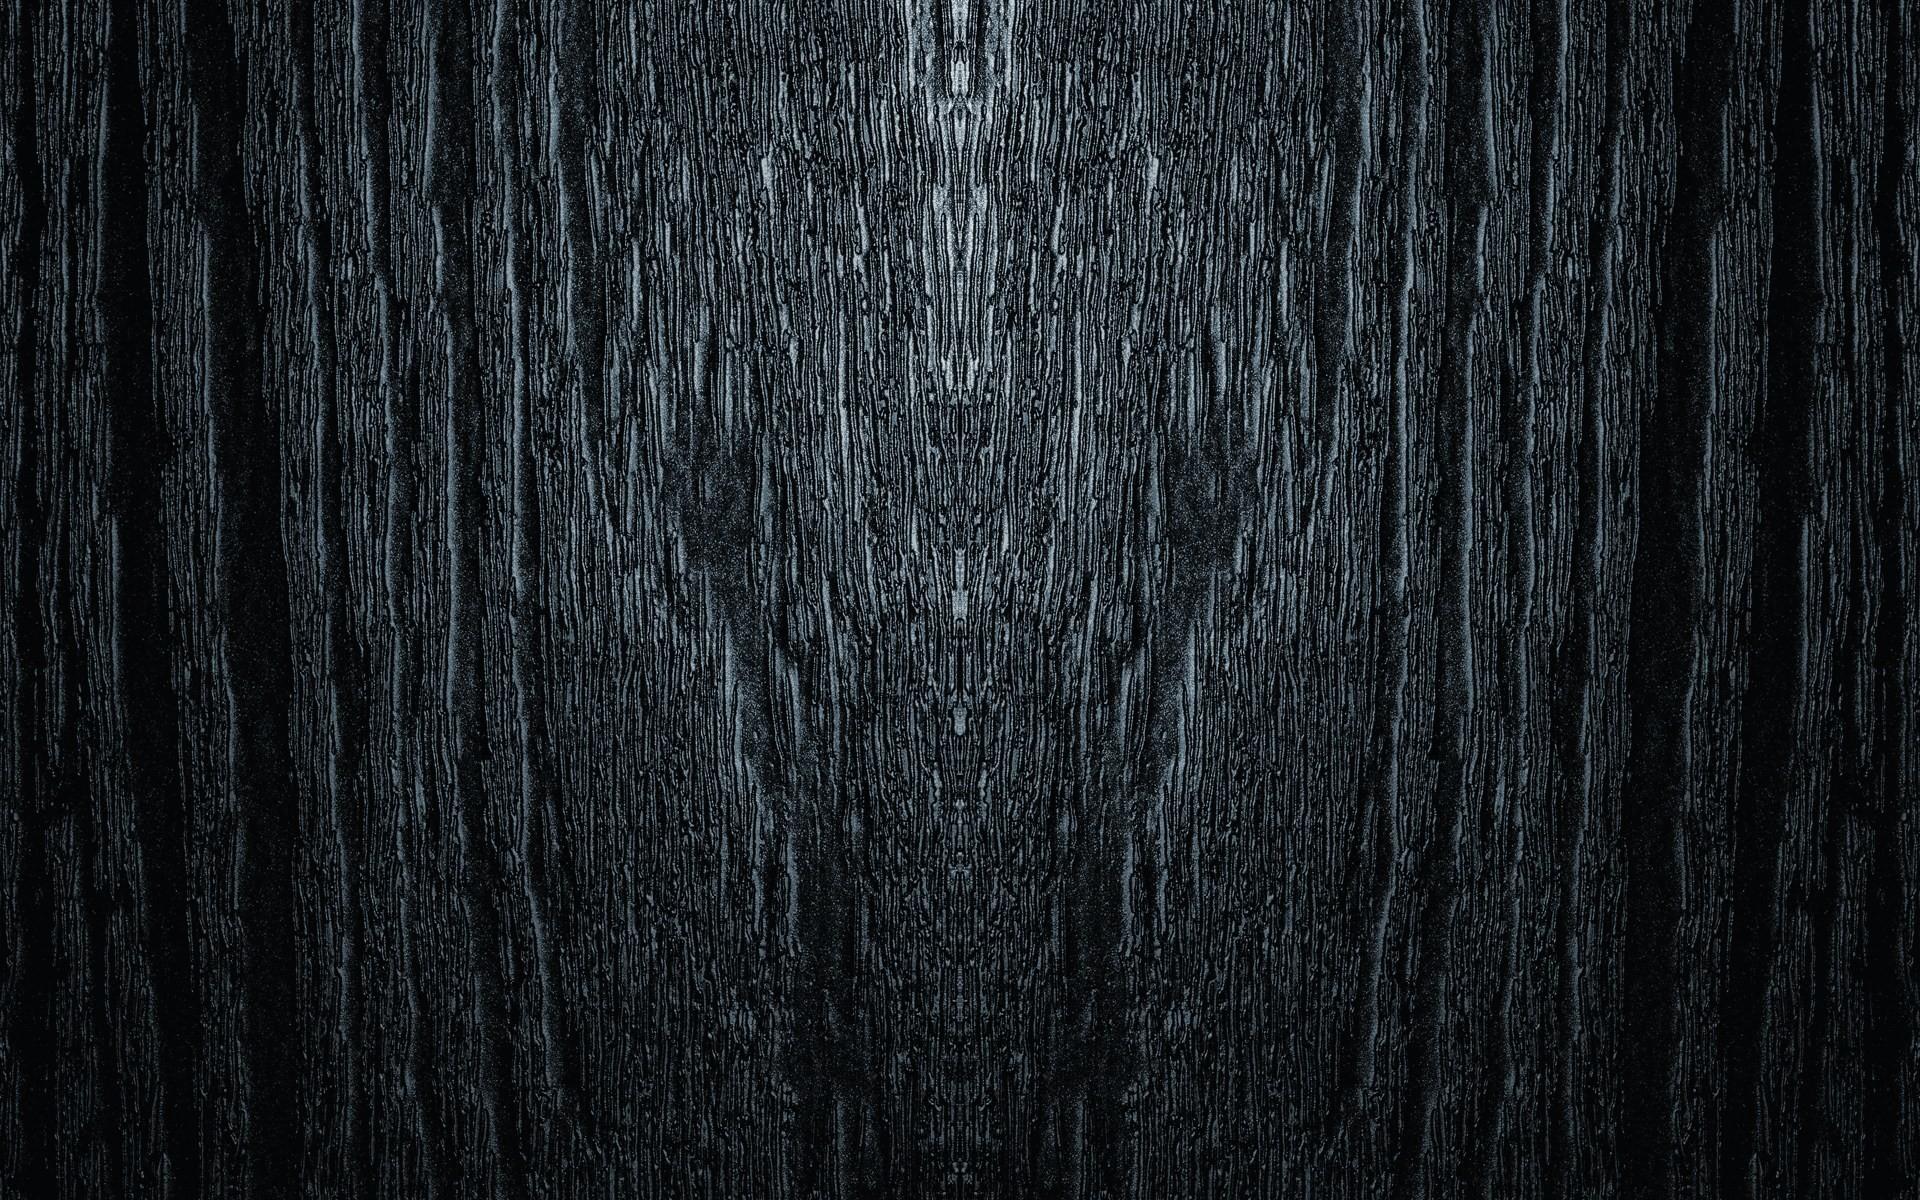 20 (FREE) BEAUTIFUL HI-RES WOOD TEXTURE WALLPAPER BACKGROUNDS – 19 Blackwood